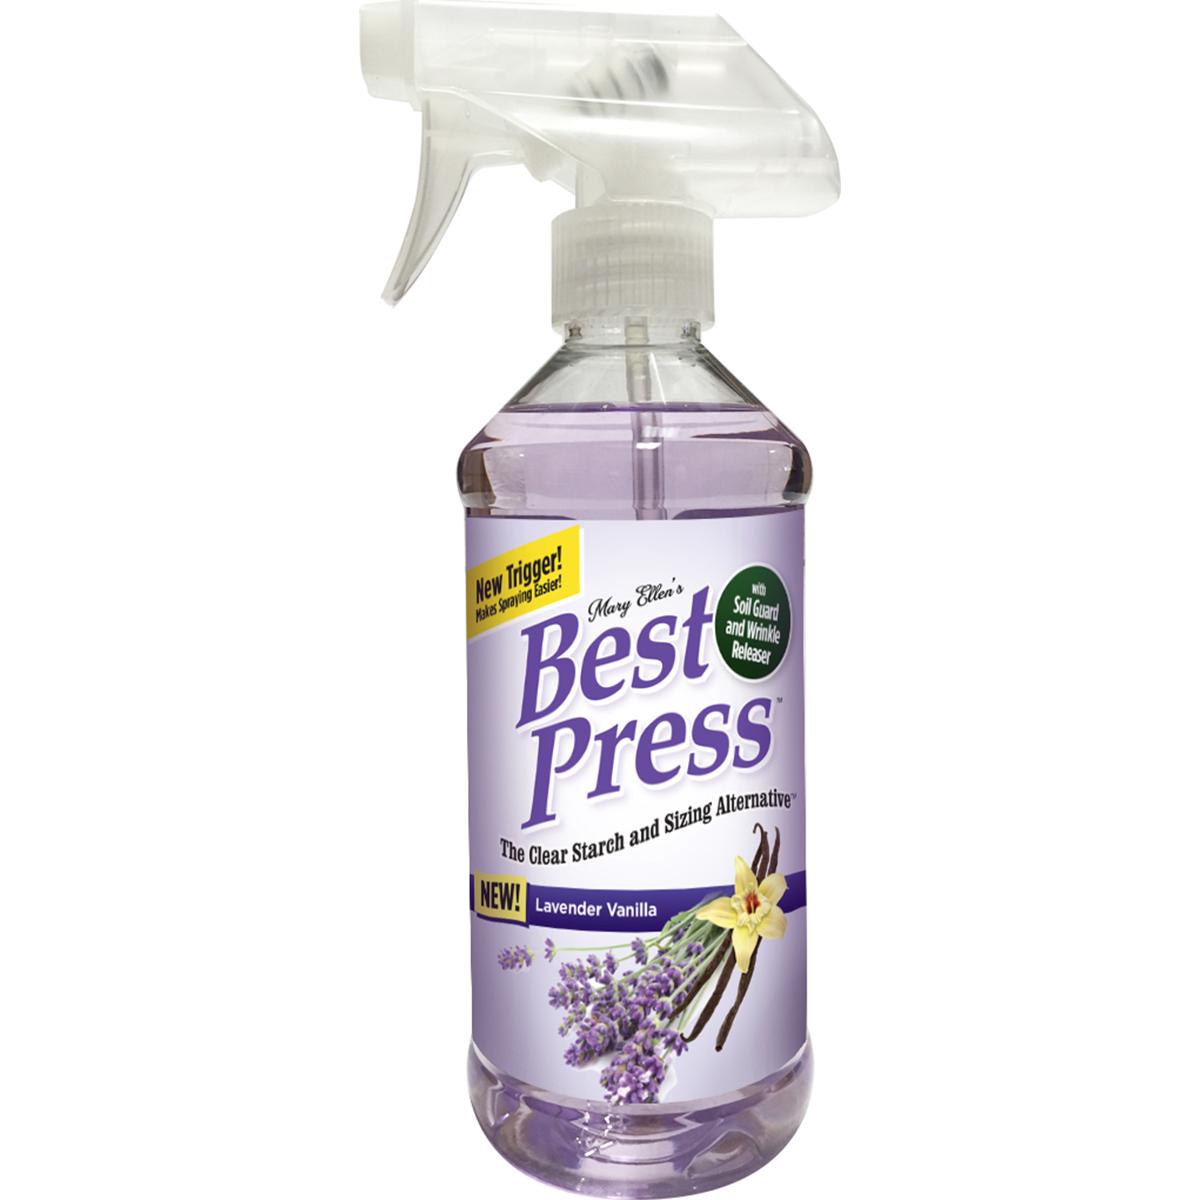 Mary Ellen's Best Press - Lavender Vanilla - 16oz